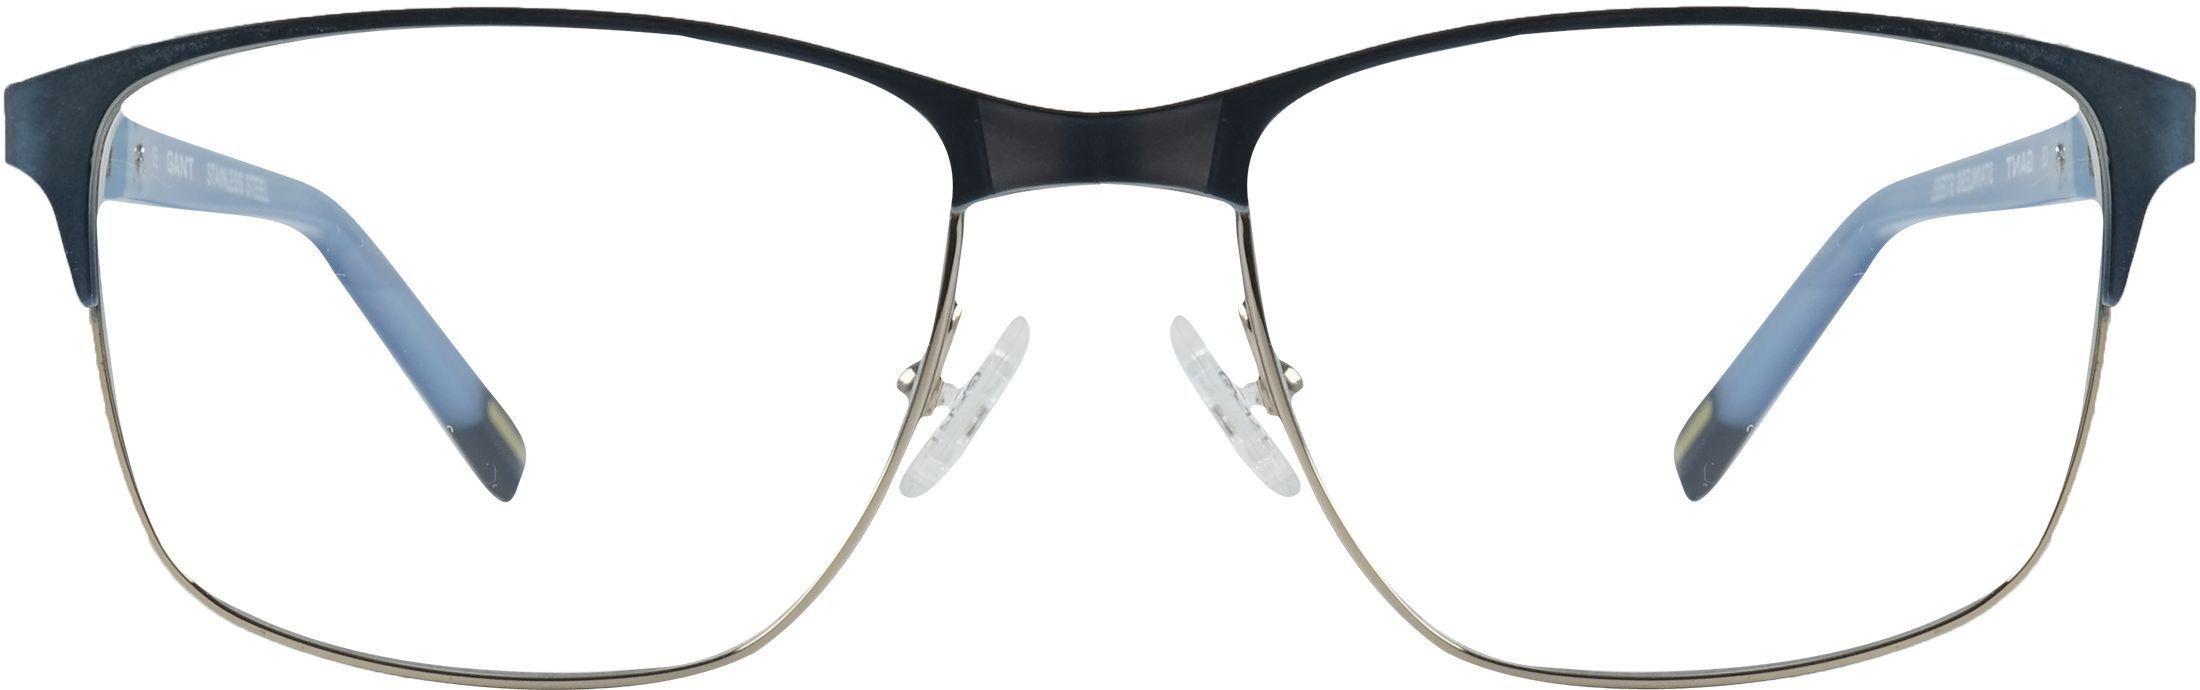 Gant ga4034 glasögon  4d01c8bc2ce89